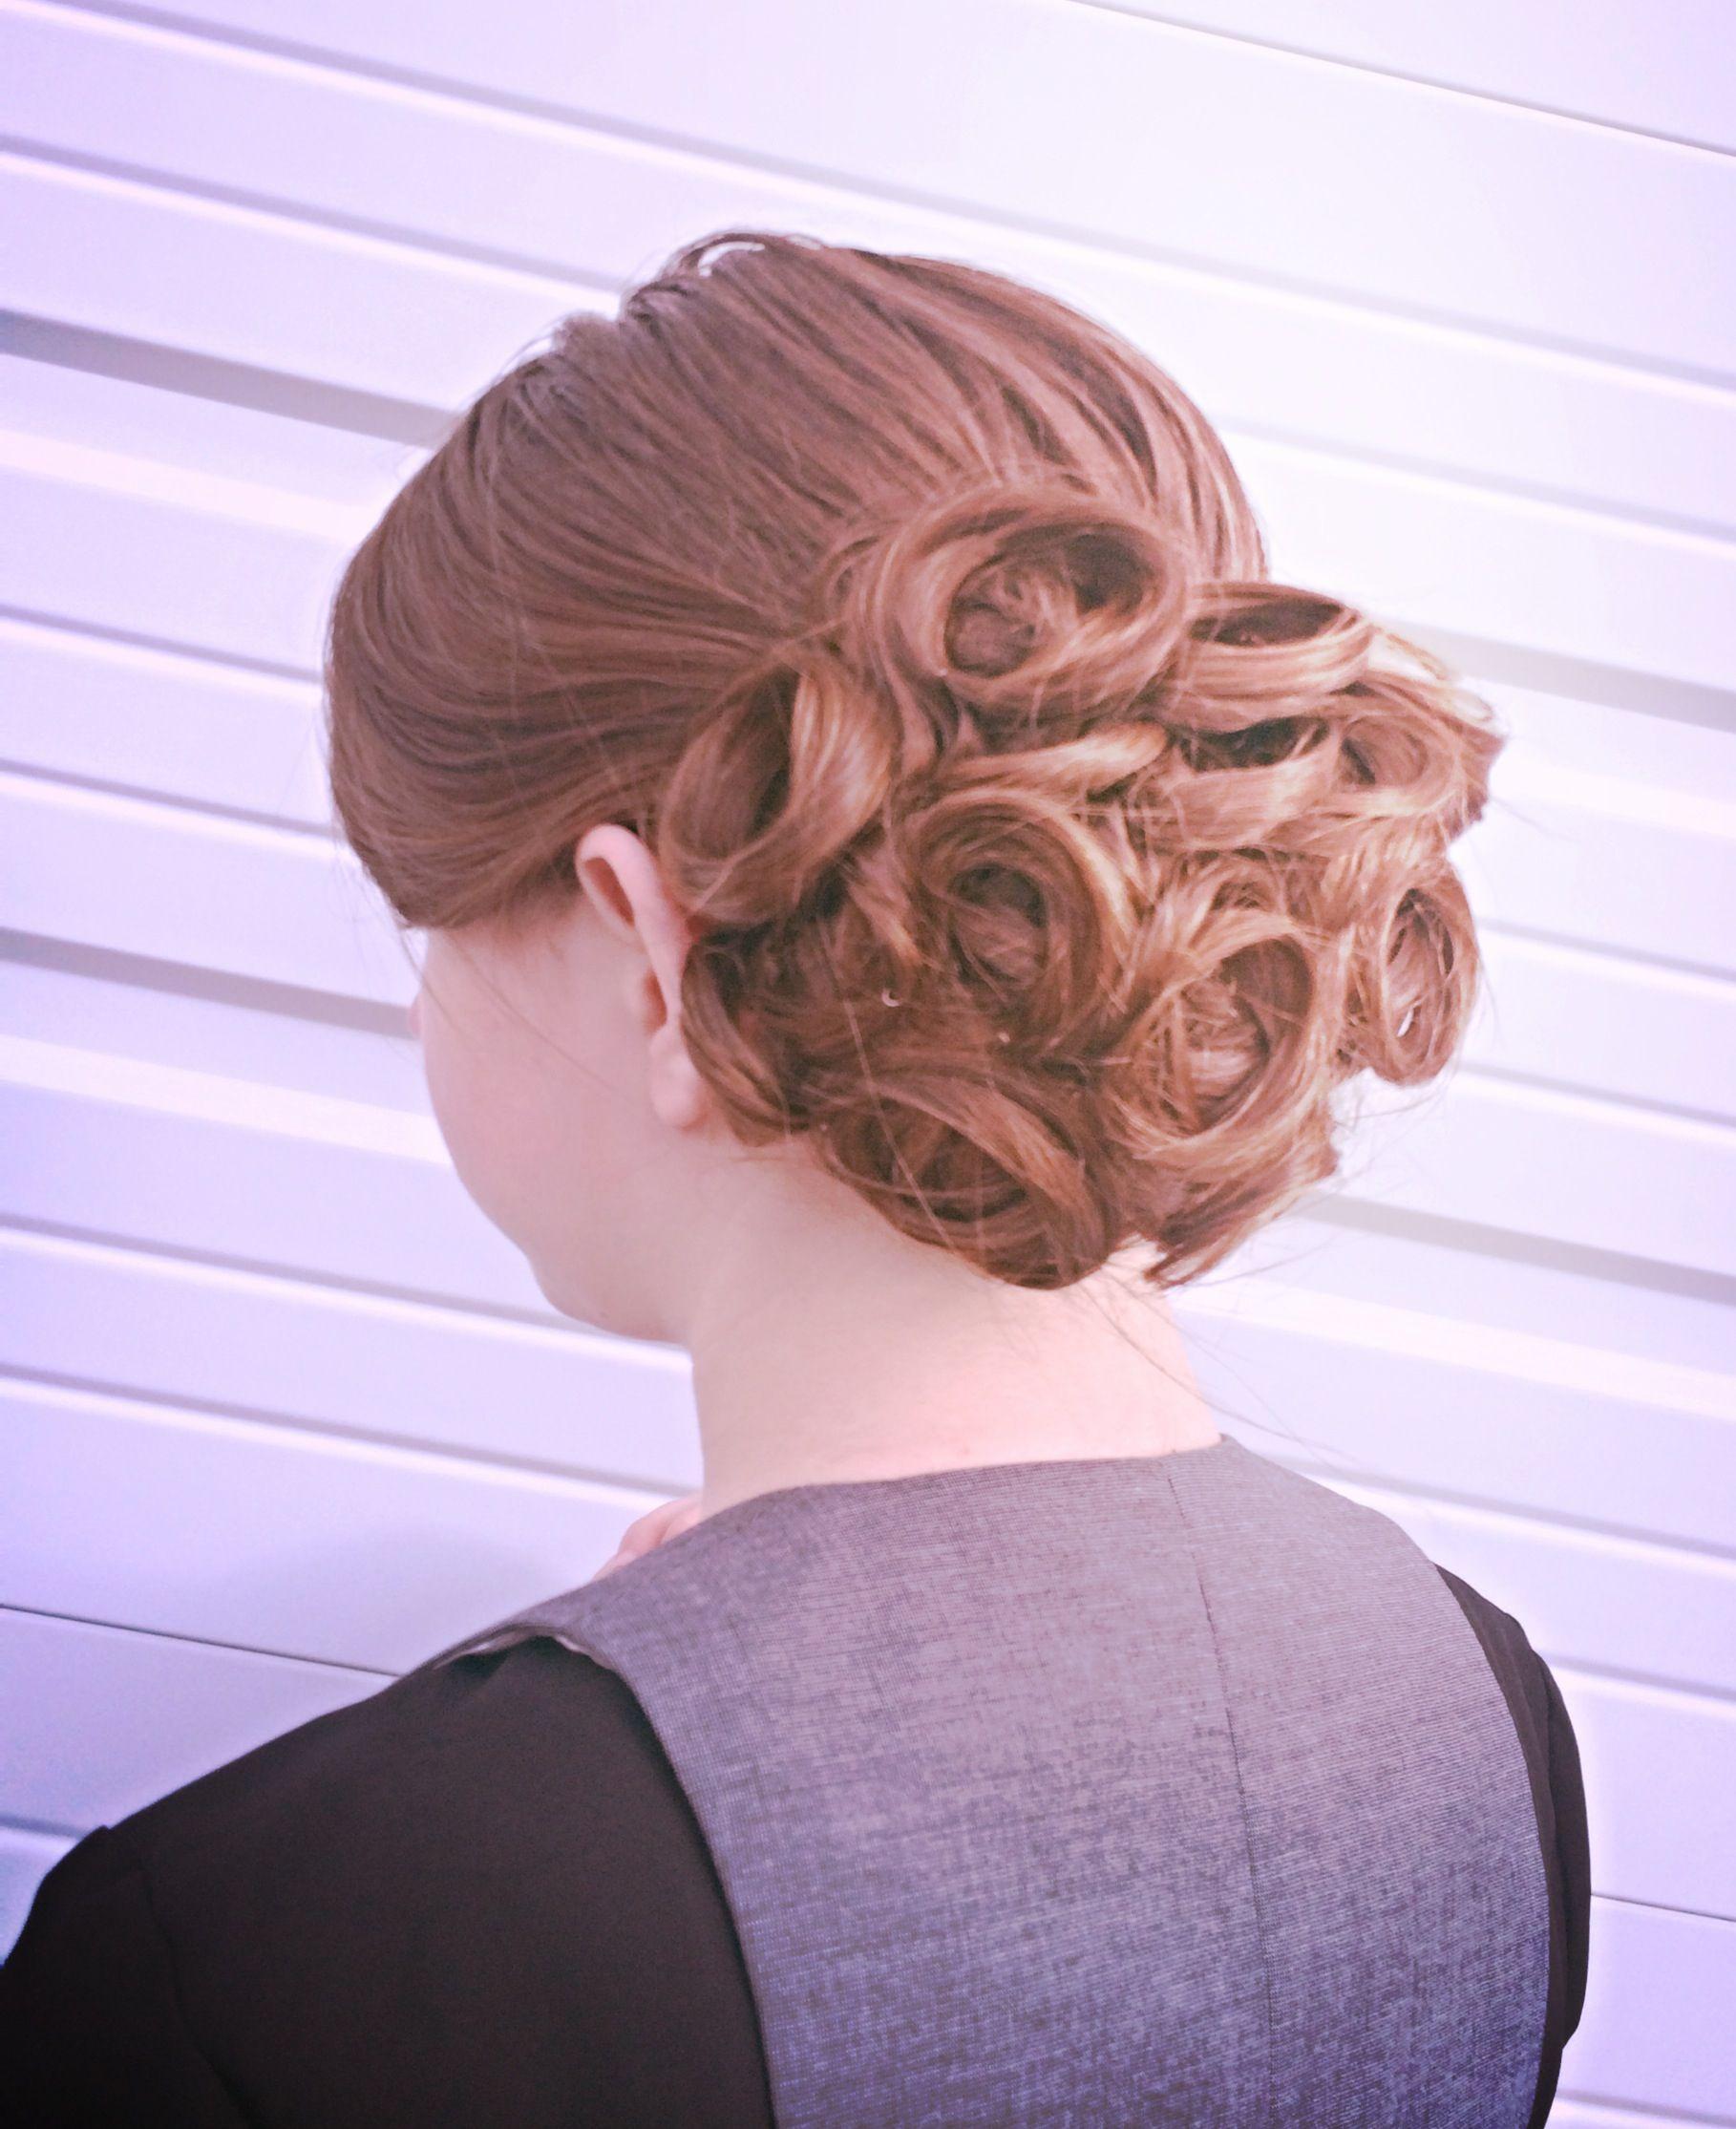 Ha Hair Accessories For Apostolic Long Hair - Pentecostal hair by maraya batts